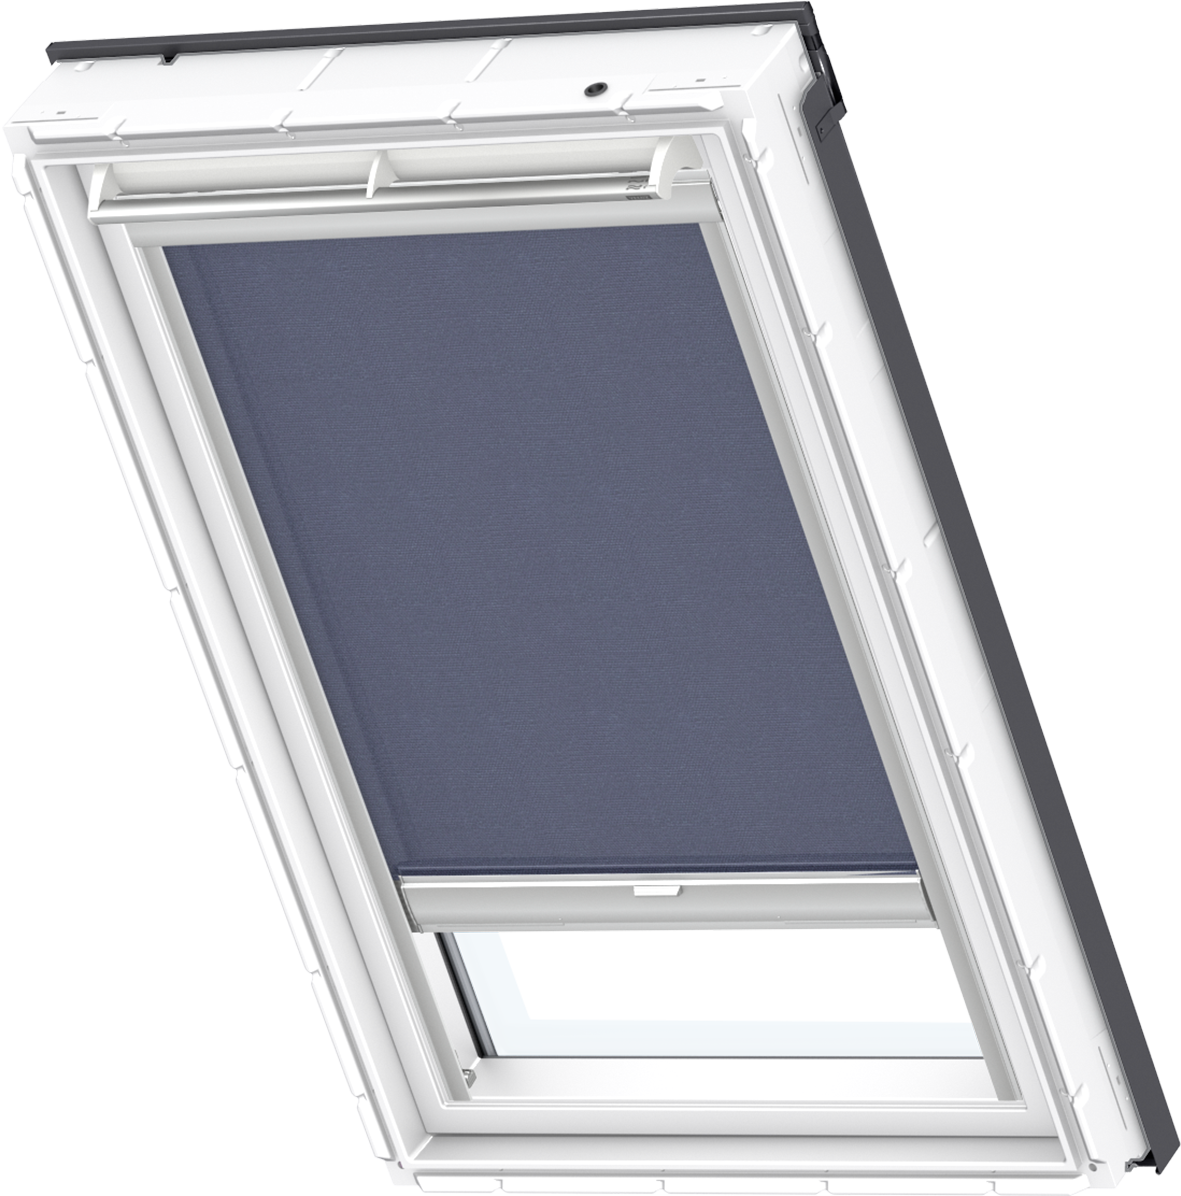 orig velux dachfenster solar rollo rsl lichtdurchl ssig. Black Bedroom Furniture Sets. Home Design Ideas